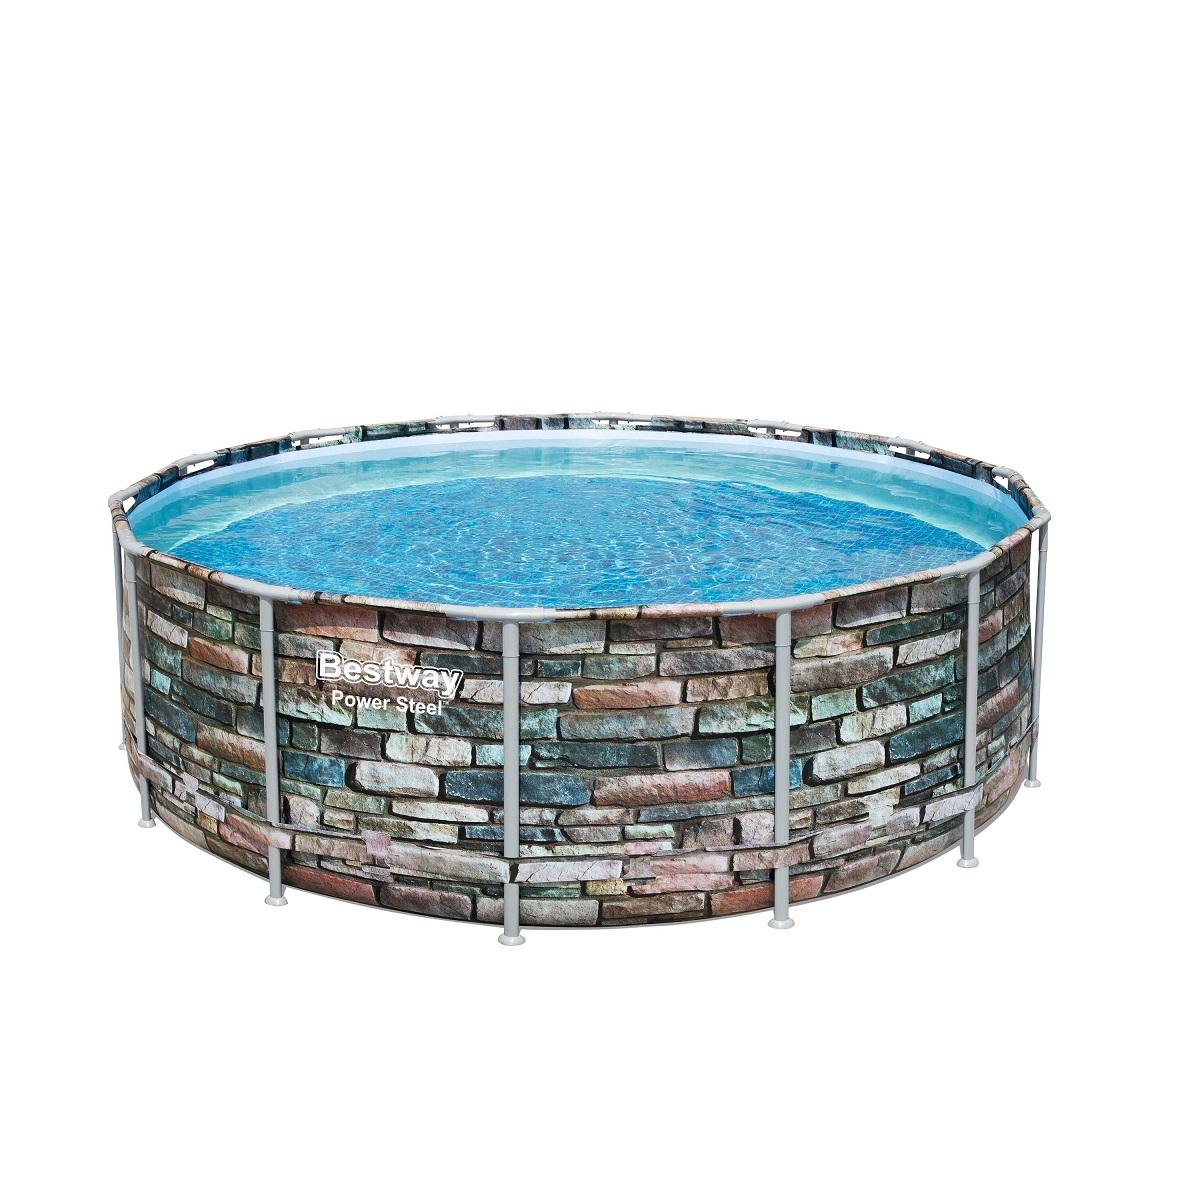 Bazén BESTWAY Power Steel 427 x 122 cm set s filtrací